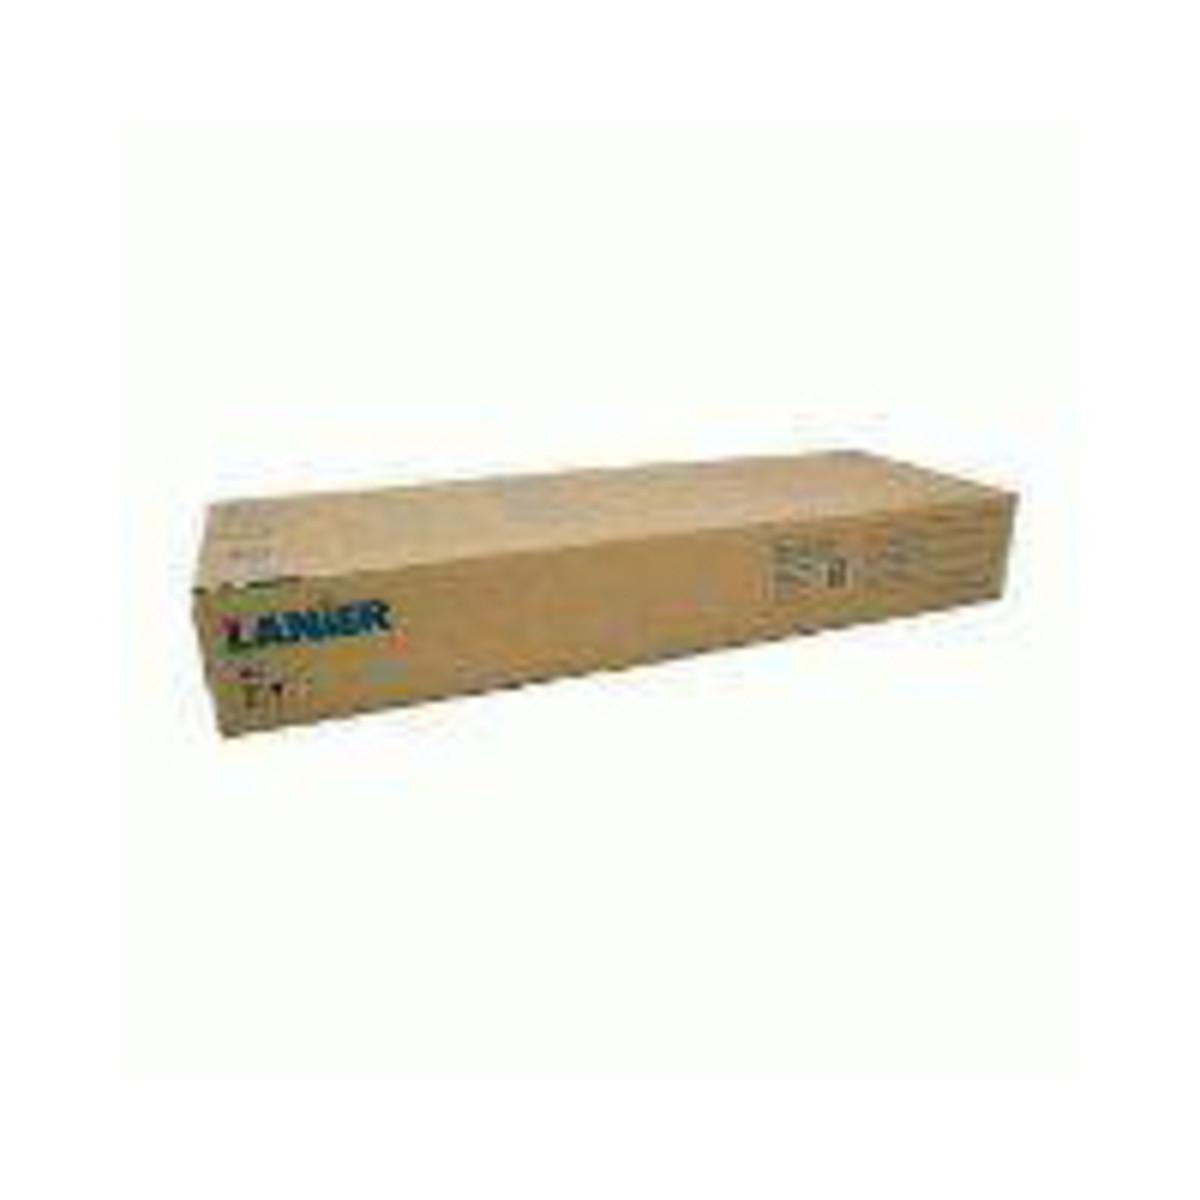 Lanier 821-057 Cyan Toner Cartridge